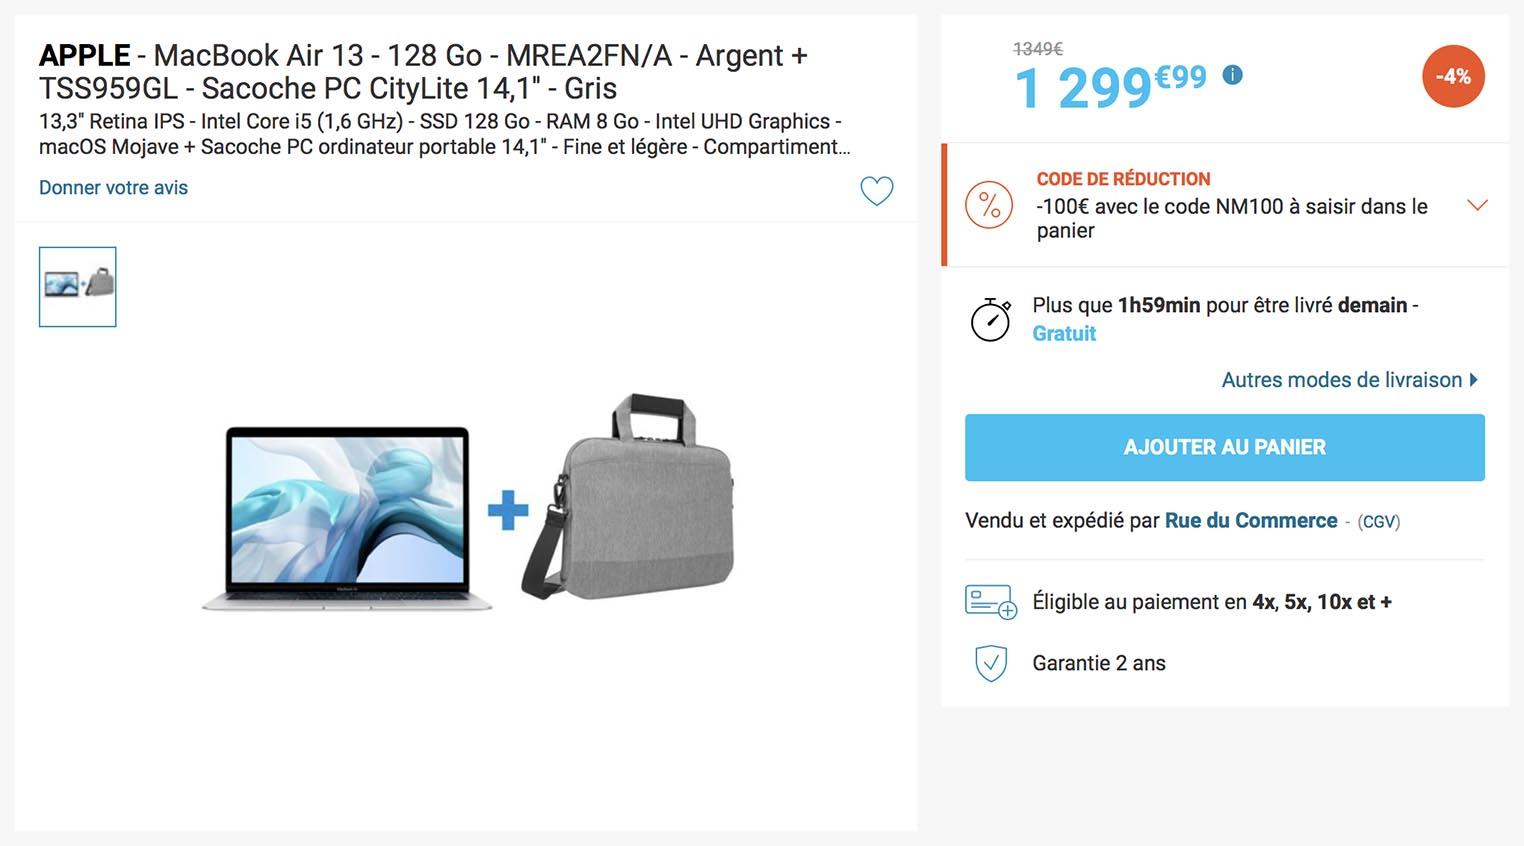 MacBook Air sacoche promo Rue du Commerce